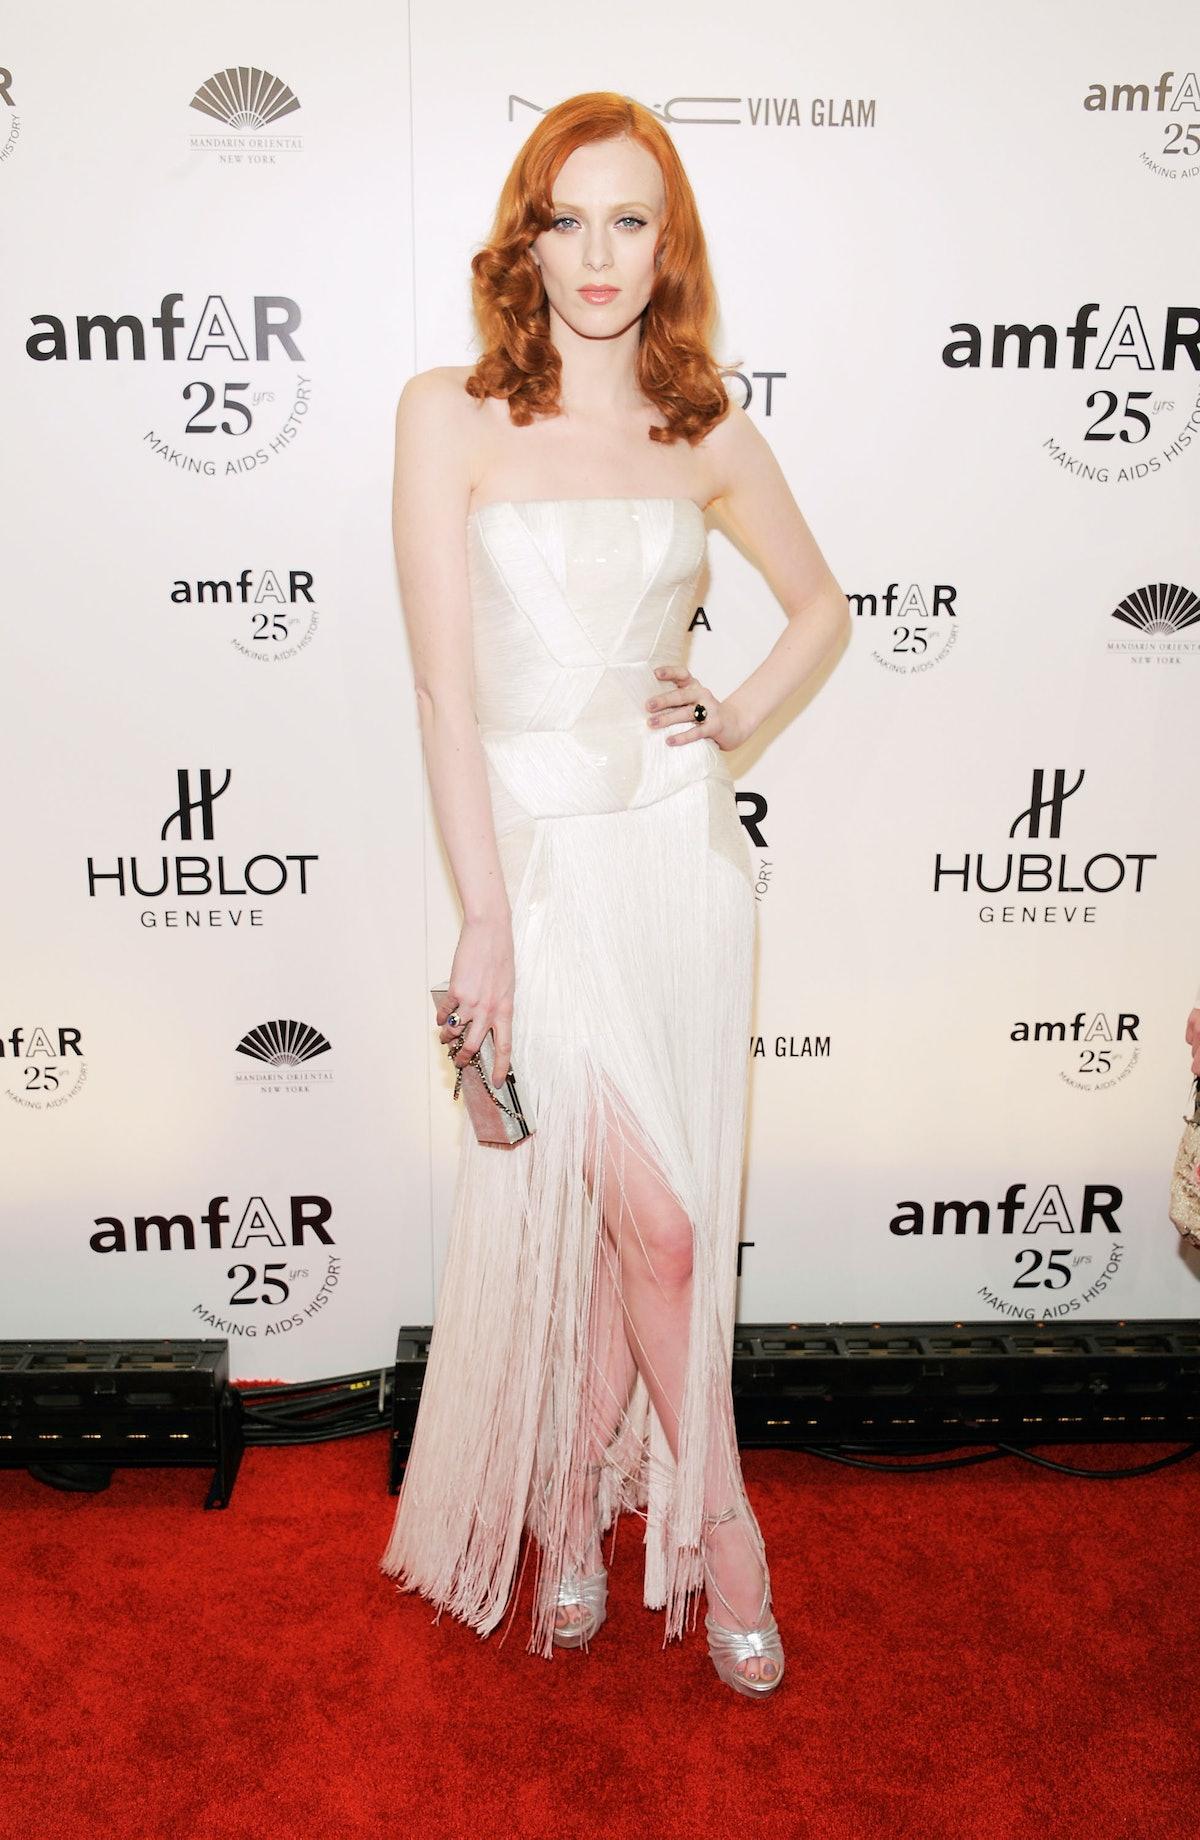 amfAR New York Gala To Kick Off Fall 2011 Fashion Week Presented By Hublot - Arrivals